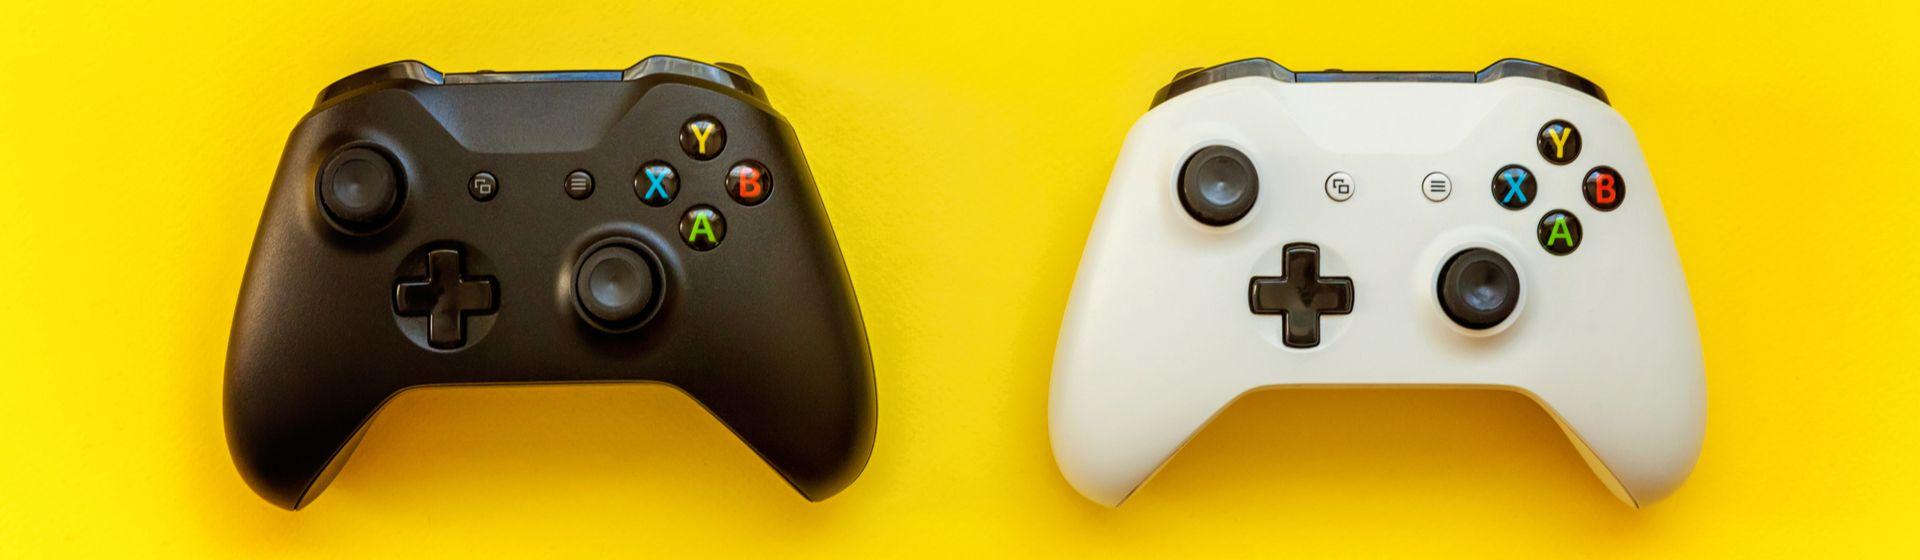 Xbox One X vs Xbox One S: qual console da Microsoft vale mais a pena?